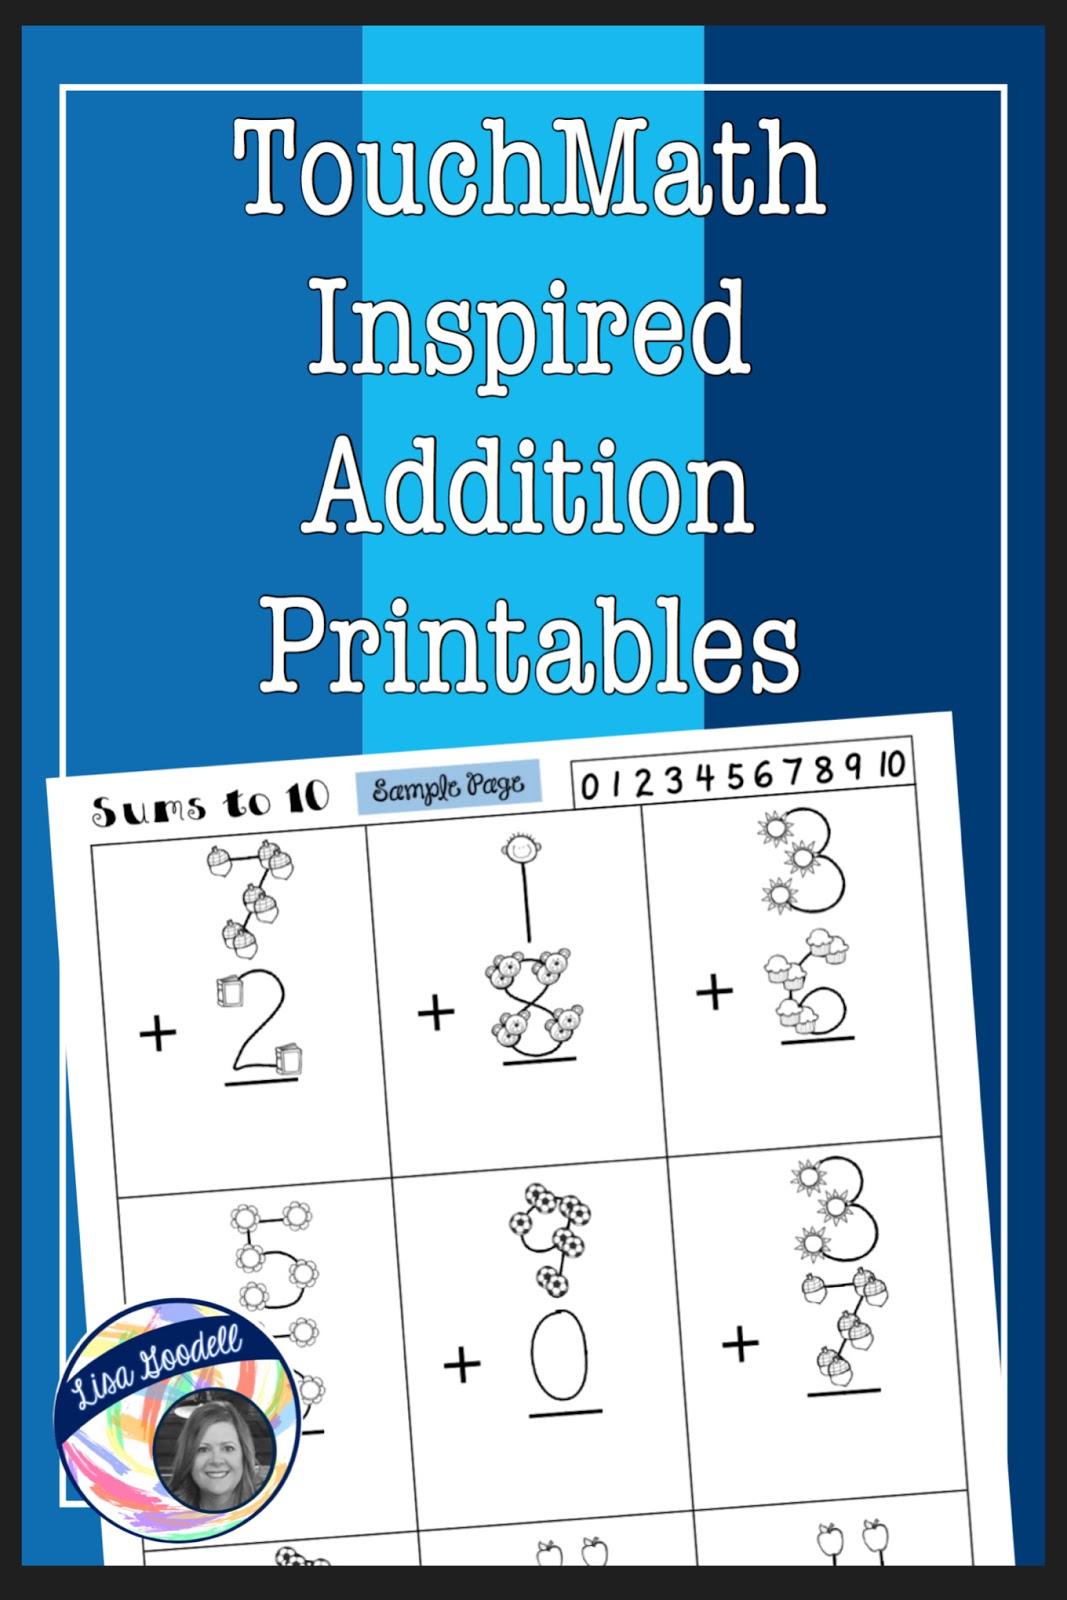 Lisa Goodell Touchmath Inspired Printables